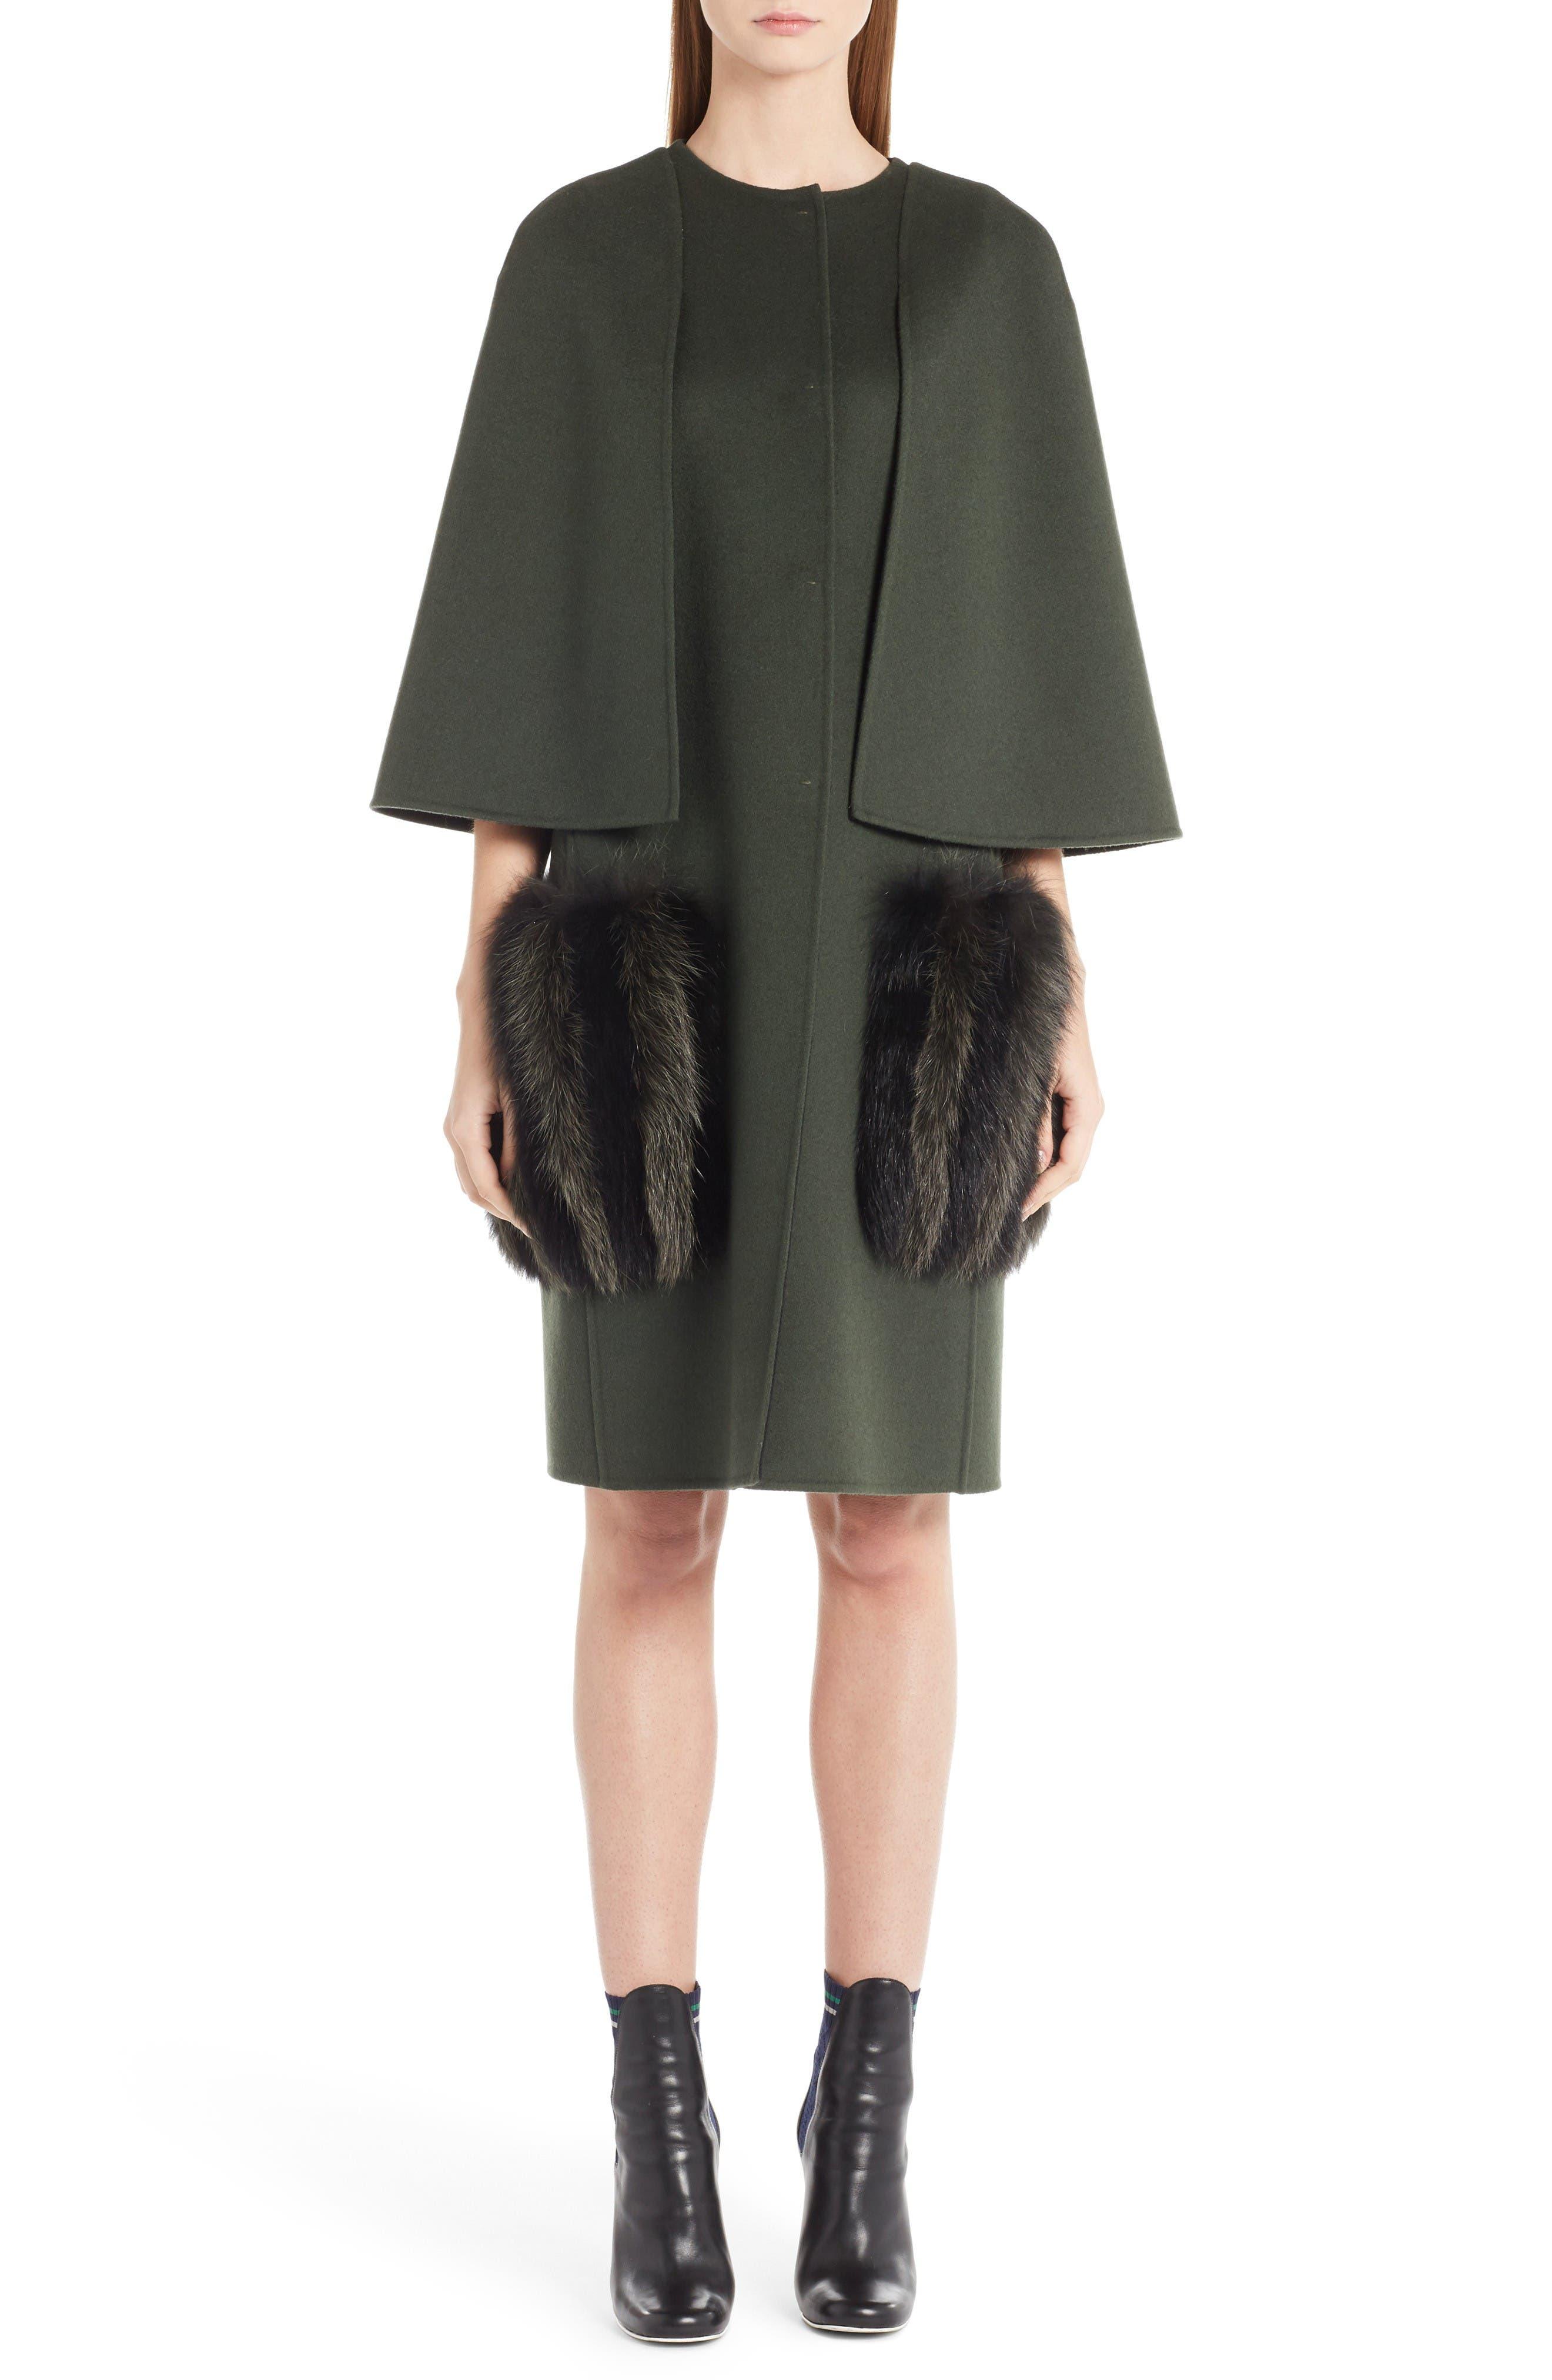 Alternate Image 1 Selected - Fendi Wool Cape Coat with Genuine Fox Fur Pockets